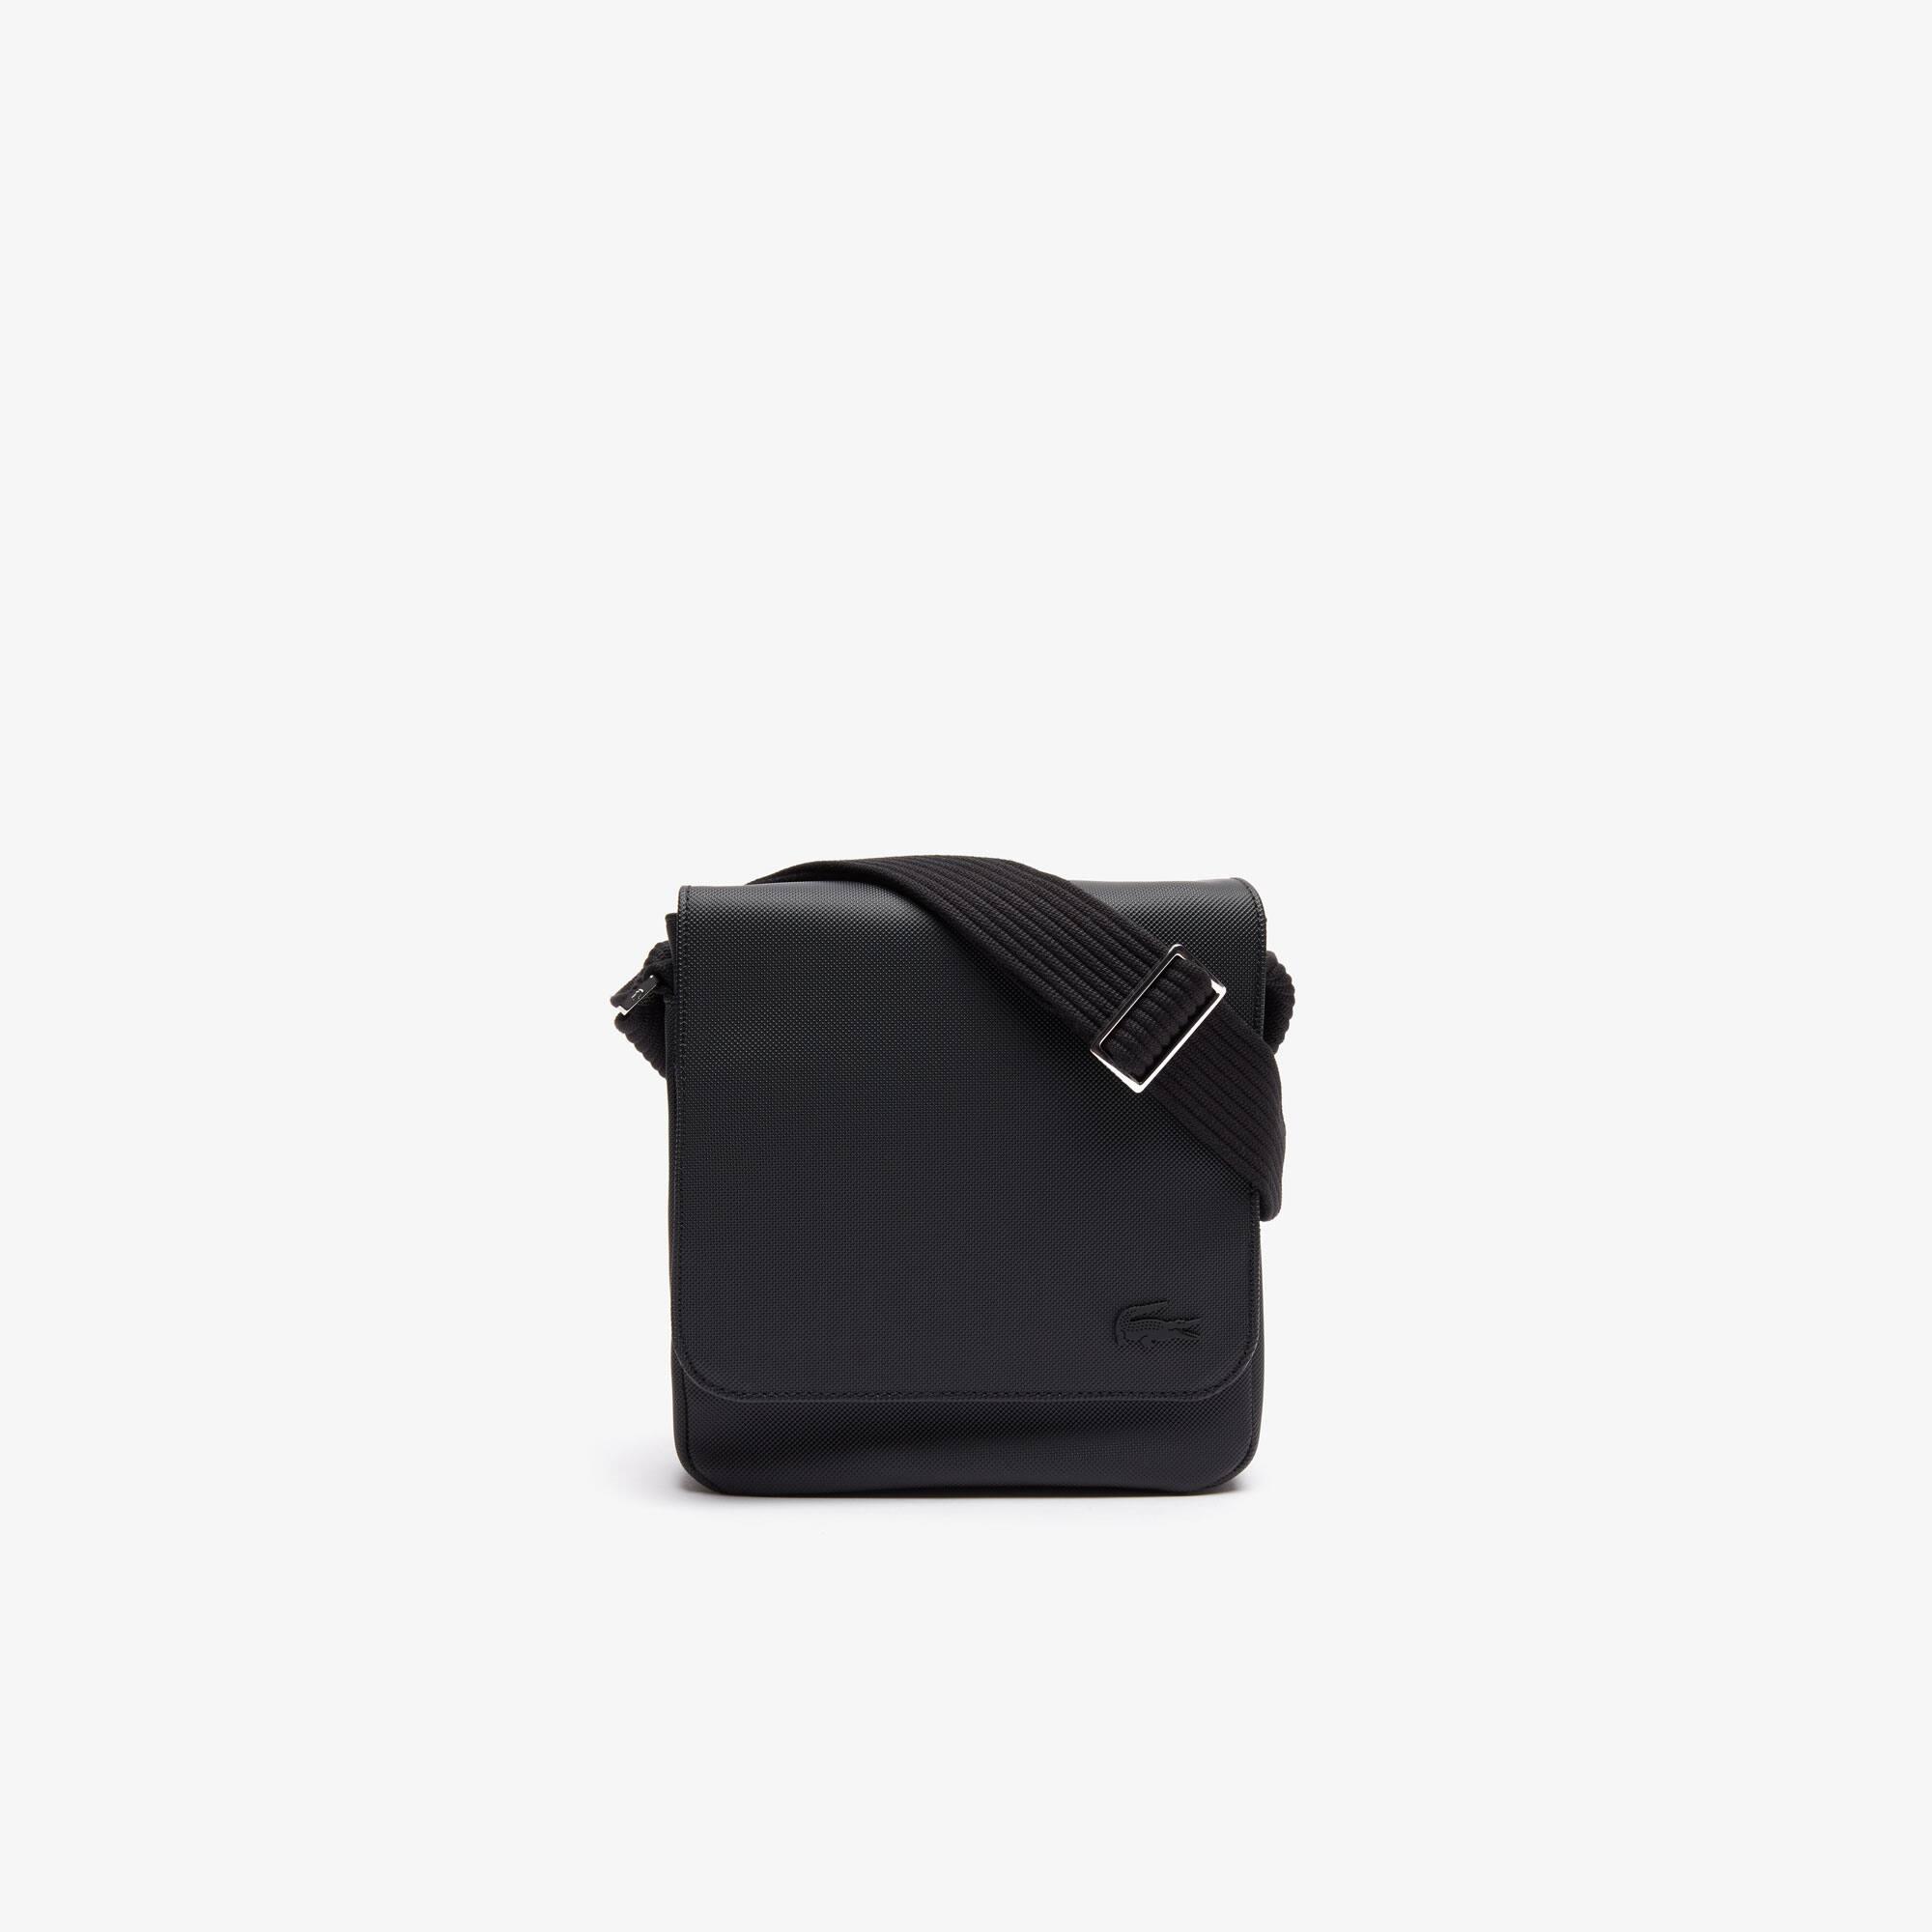 Herren-Tasche CLASSIC aus Petit Piqué mit Klappe